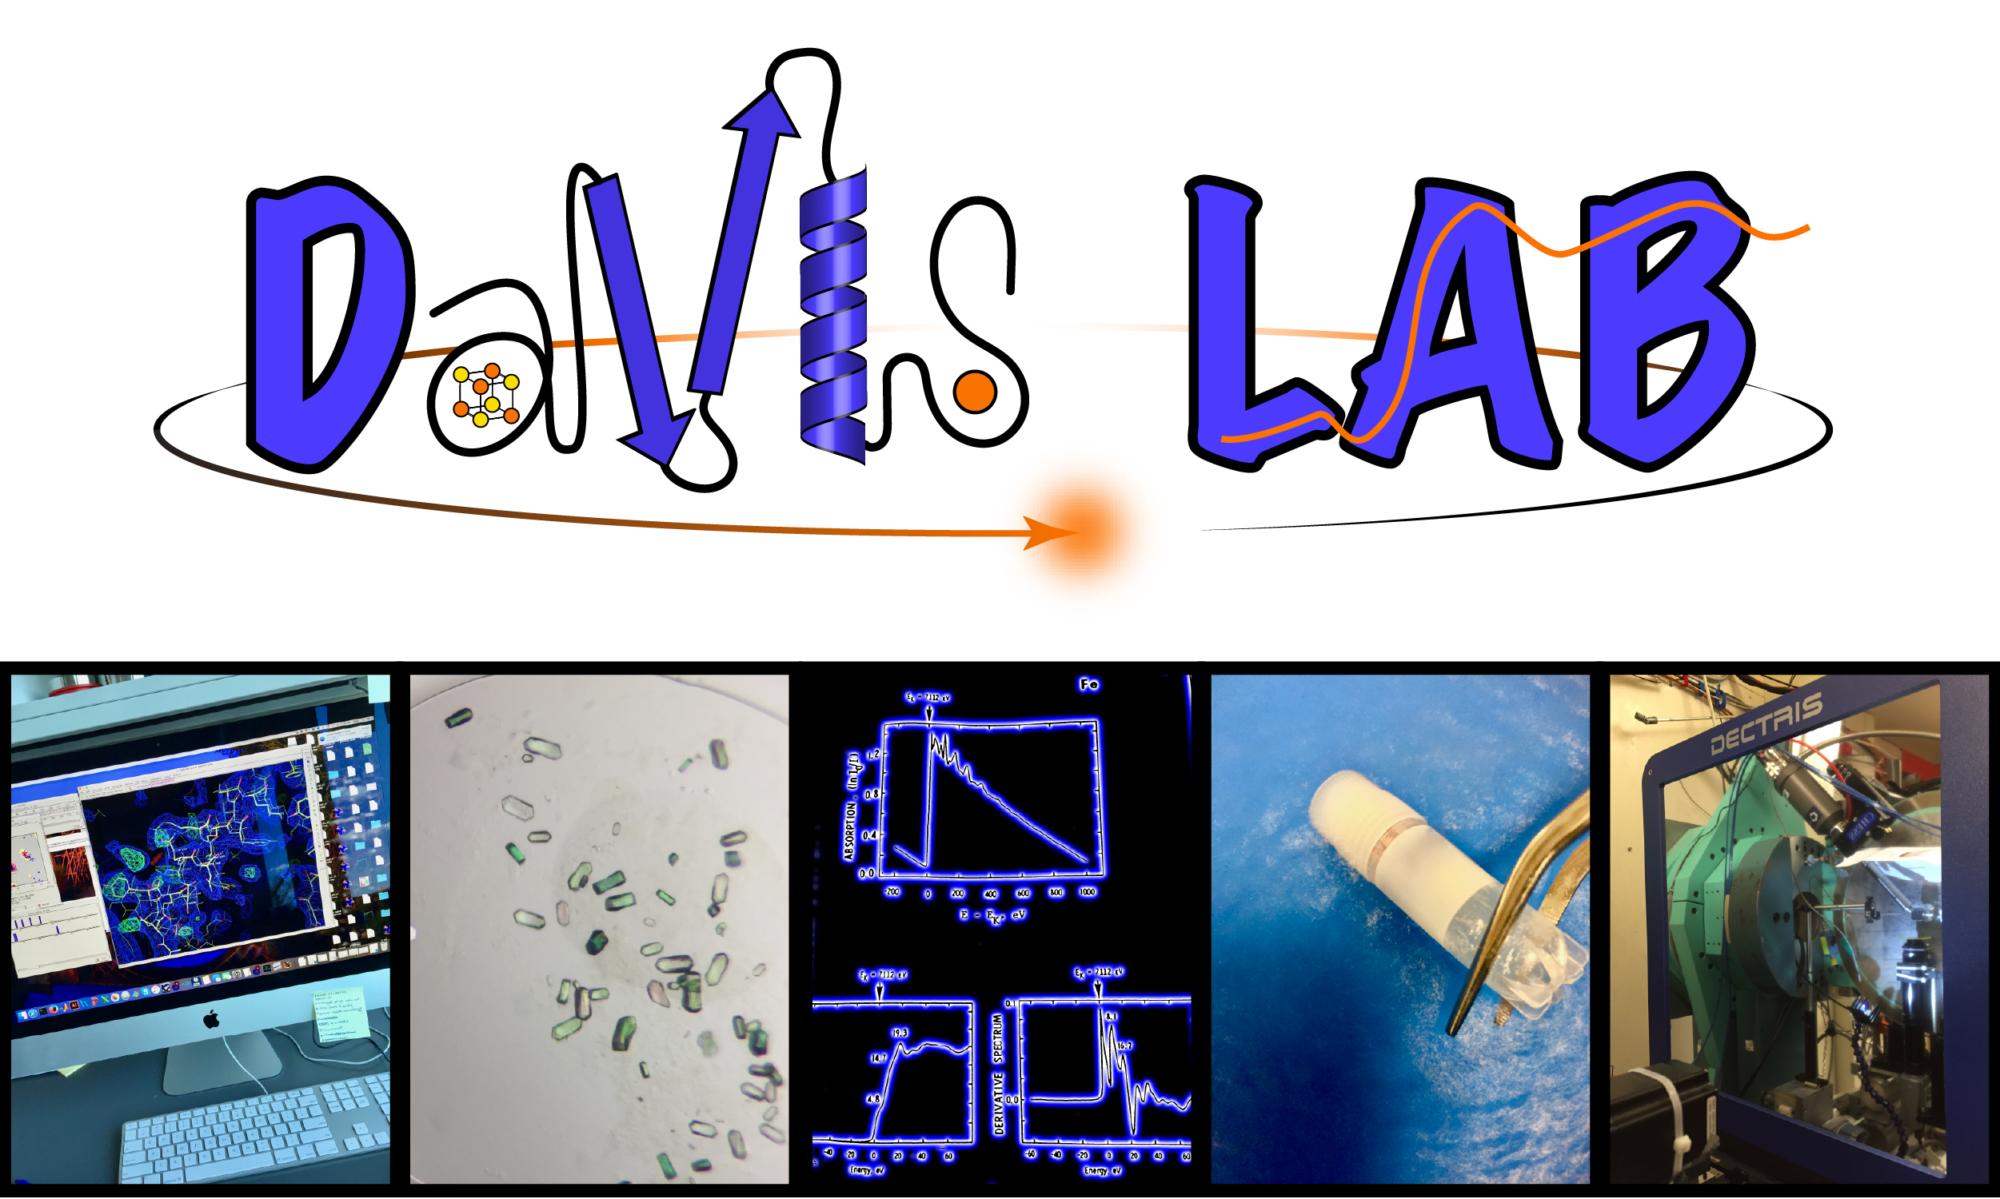 The Davis Lab